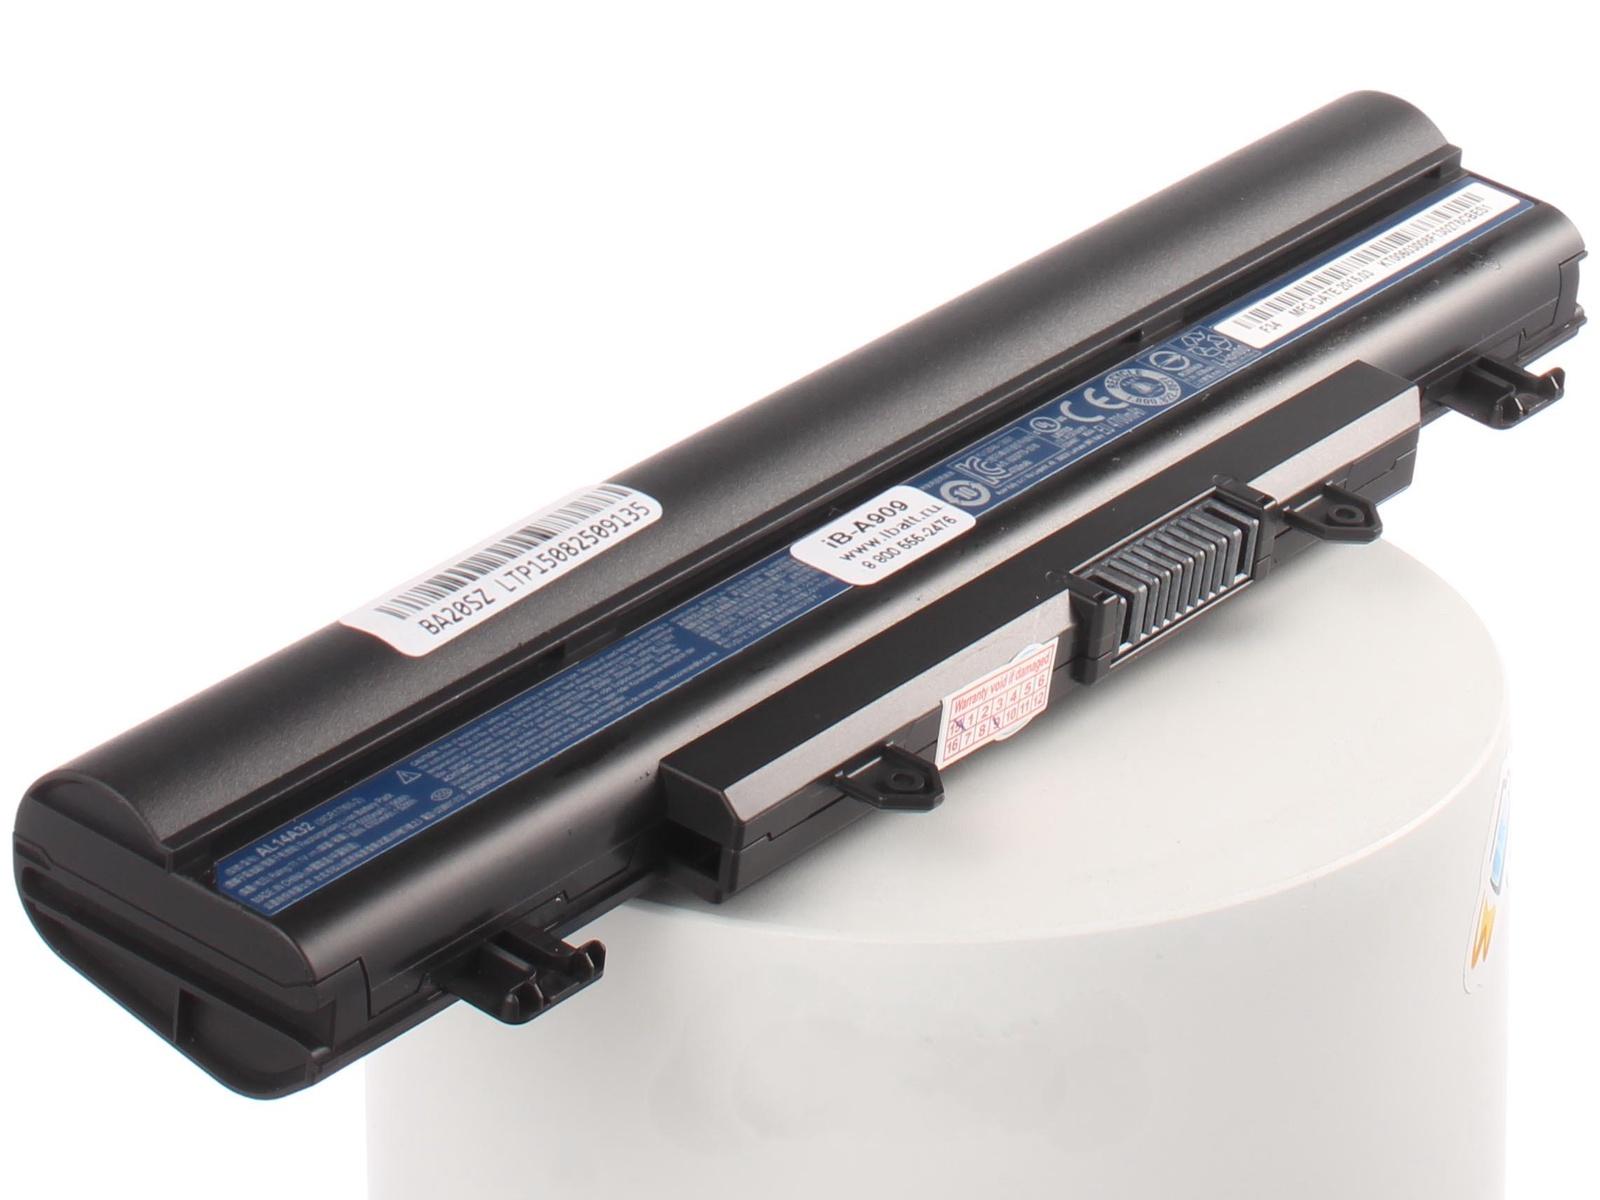 Аккумулятор для ноутбука iBatt для Acer Aspire E5-551G-T595, Aspire E5-411-P4F2, Aspire E5-571G-568M, Aspire E5-571G-350S, Aspire V5-572P, Extensa 2510G-54TK, Aspire E5-511G-P4Q4, ASPIRE E5-511-P7QQ, Aspire E5-521G-8022 ноутбук acer aspire e5 576g 31sj nx gvber 031